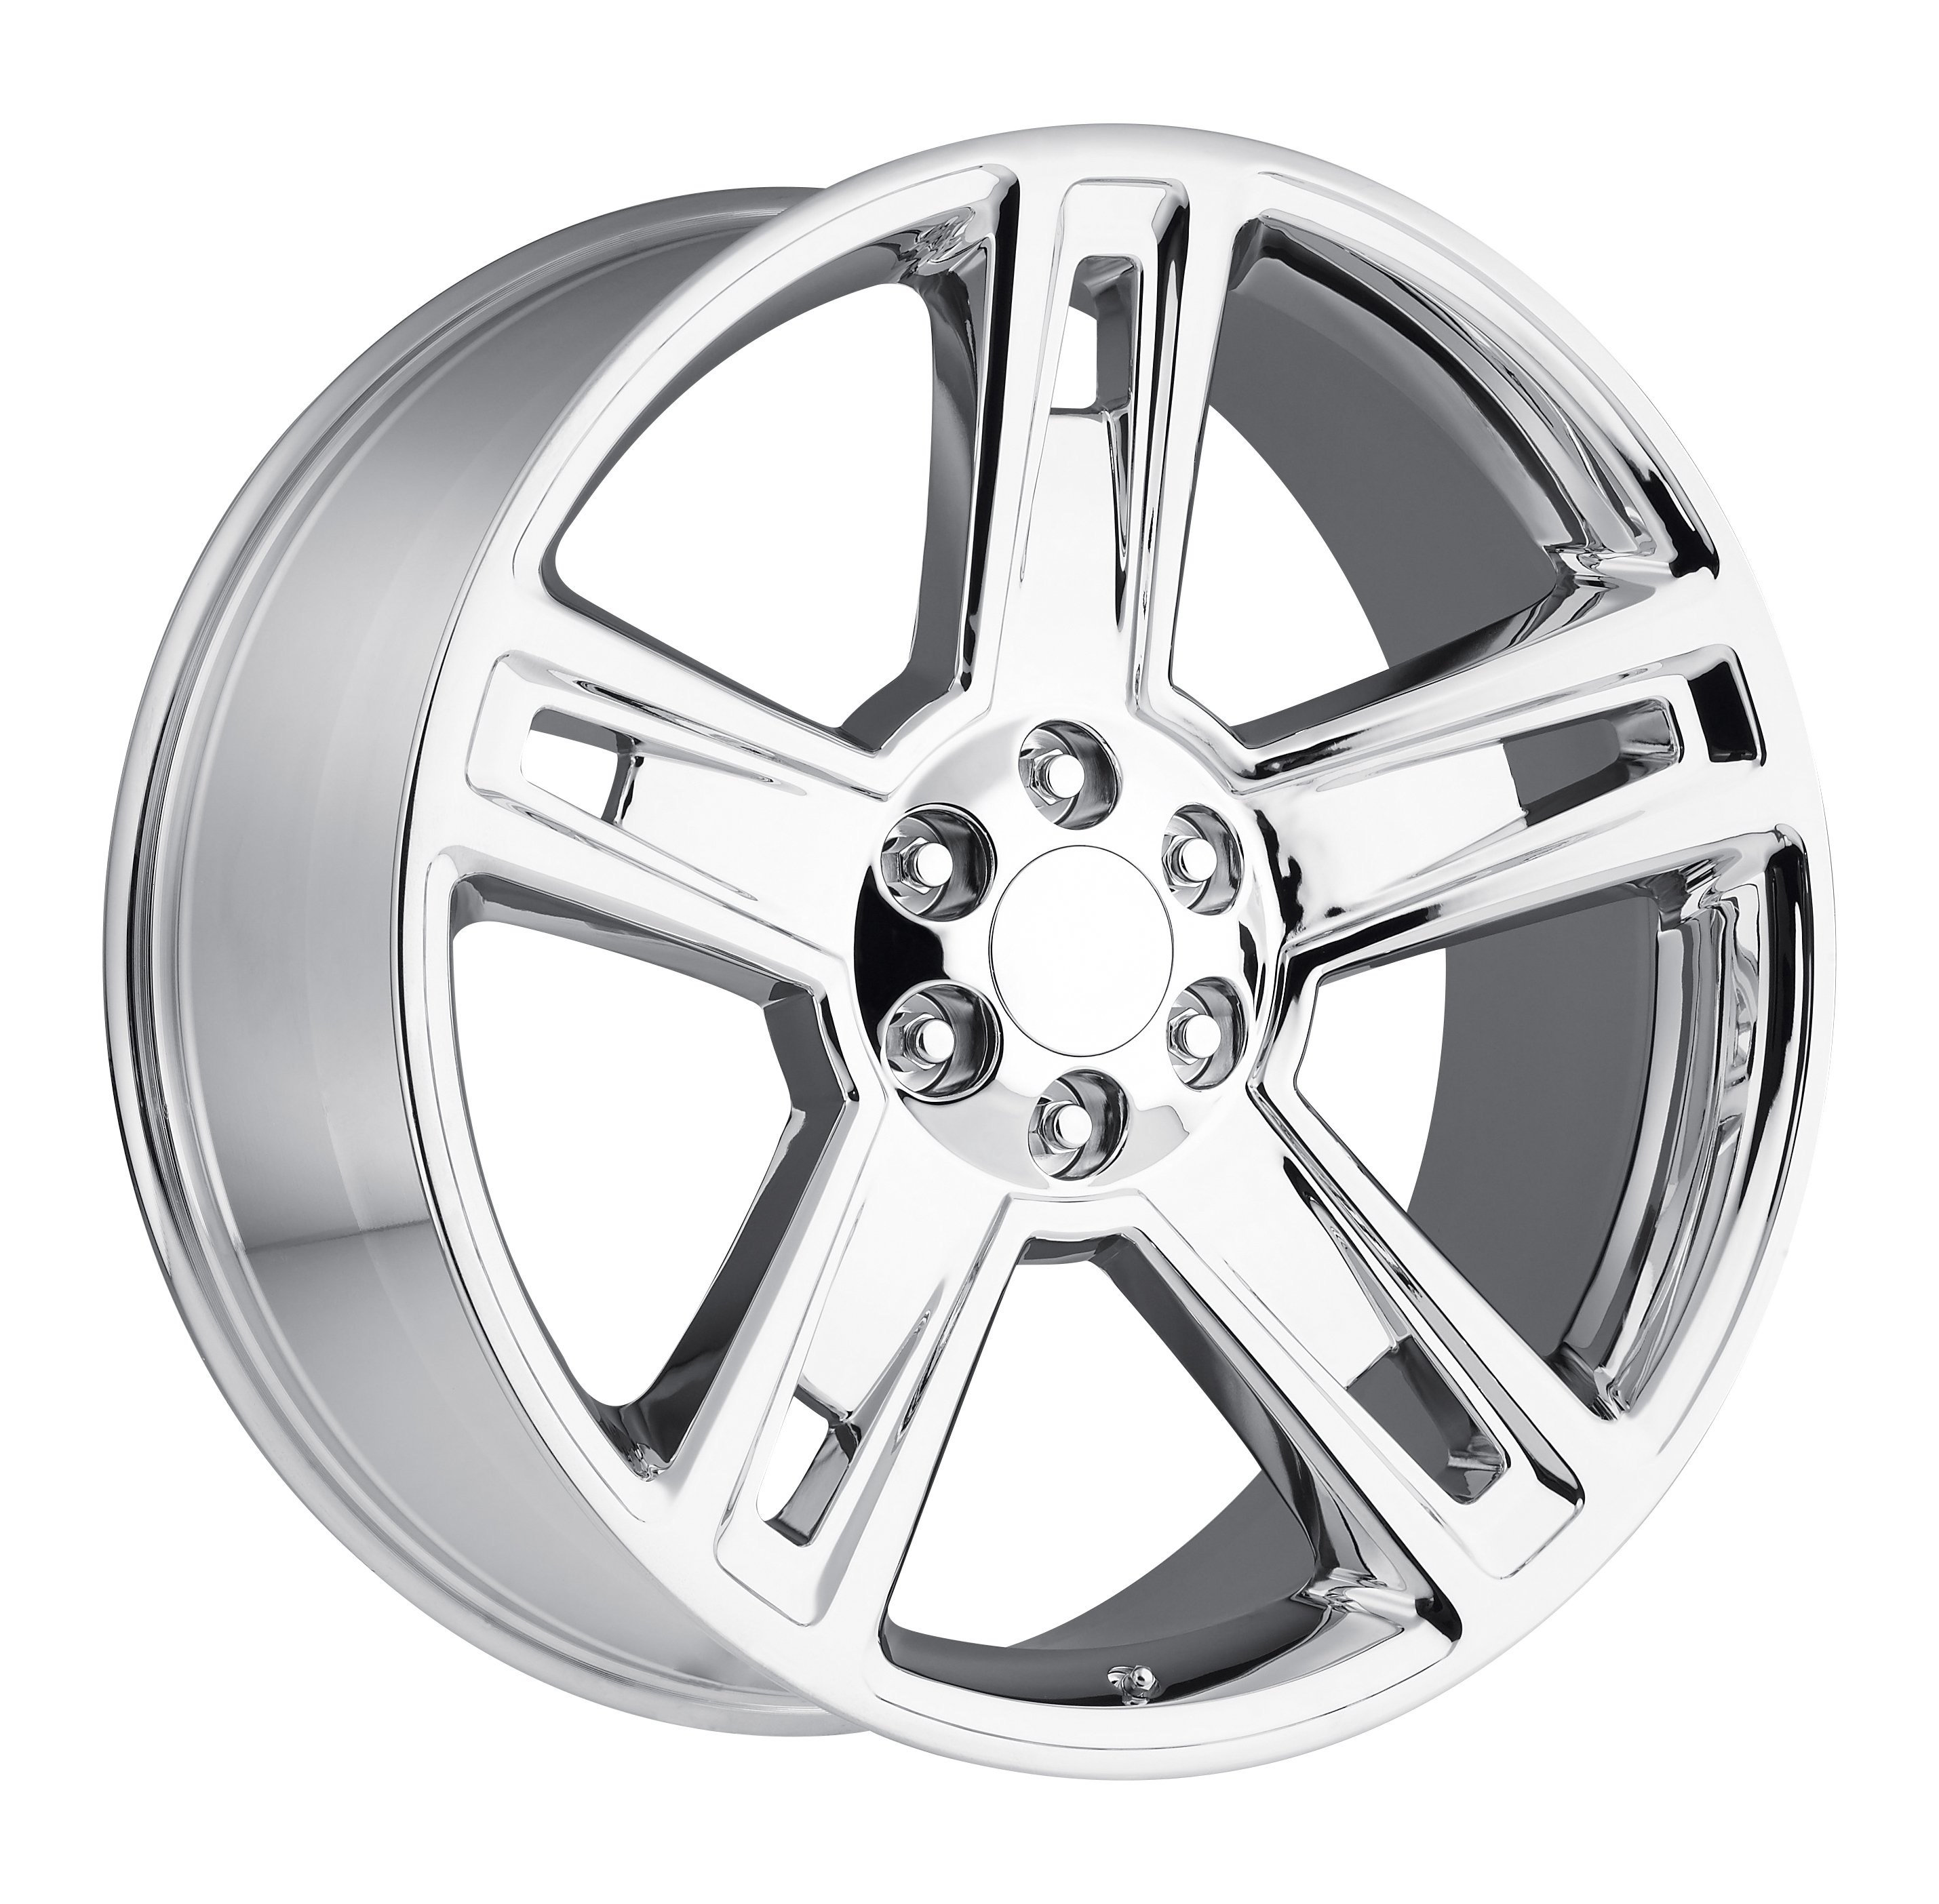 chevrolet silverado oem replica wheels fr 34 shop now 2014 Chevrolet Silverado 1500 LT Black 34 chevrolet 2015 1500 chrome